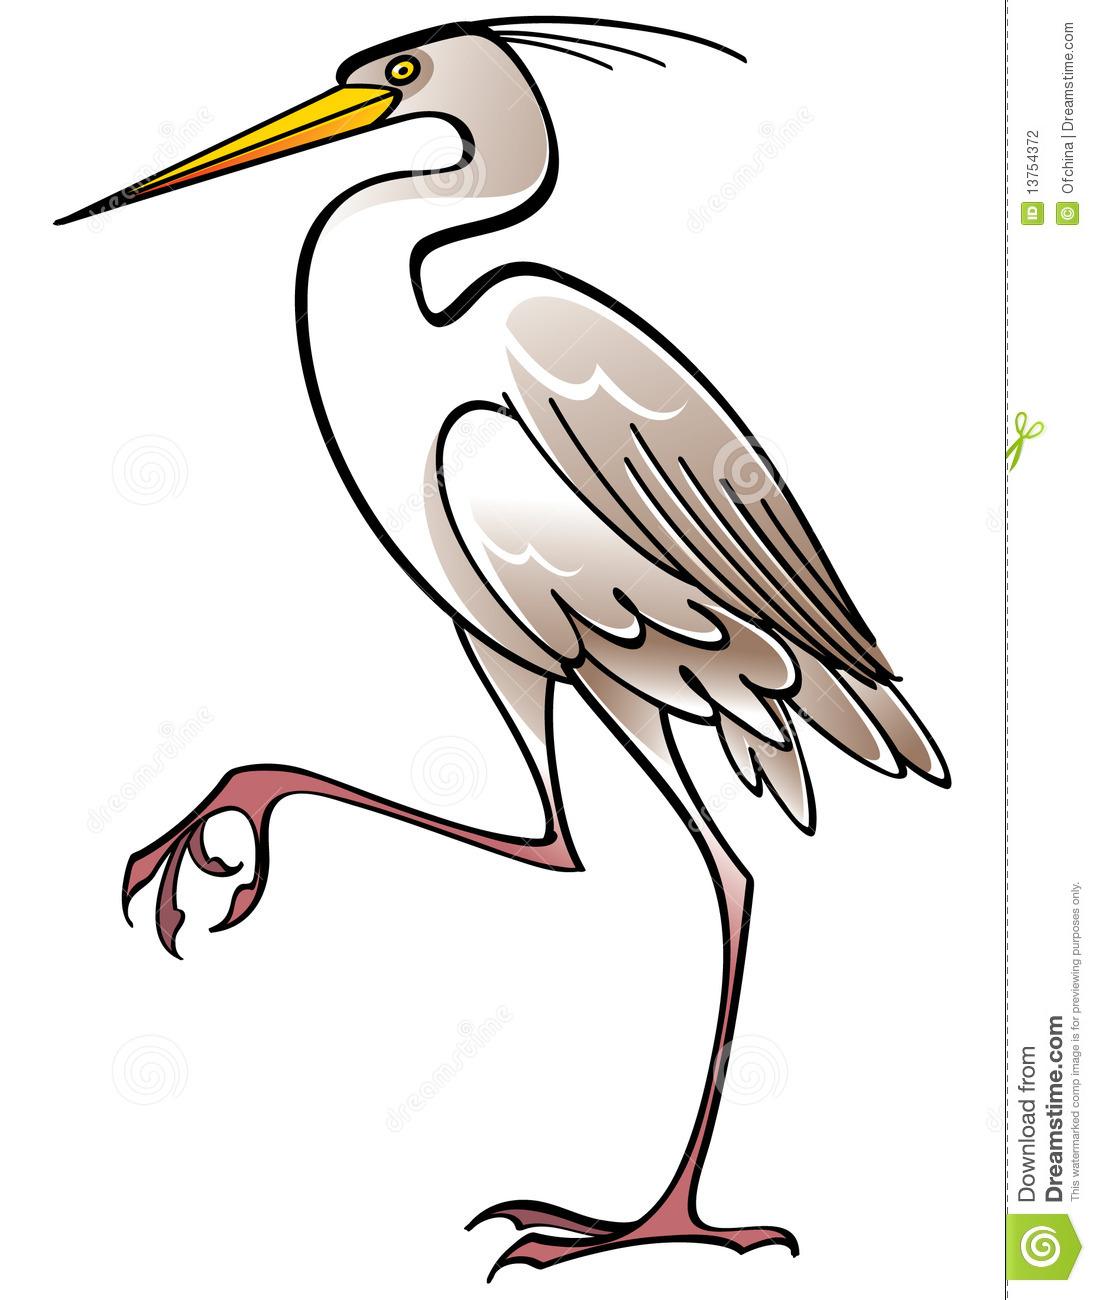 Heron Clipart.